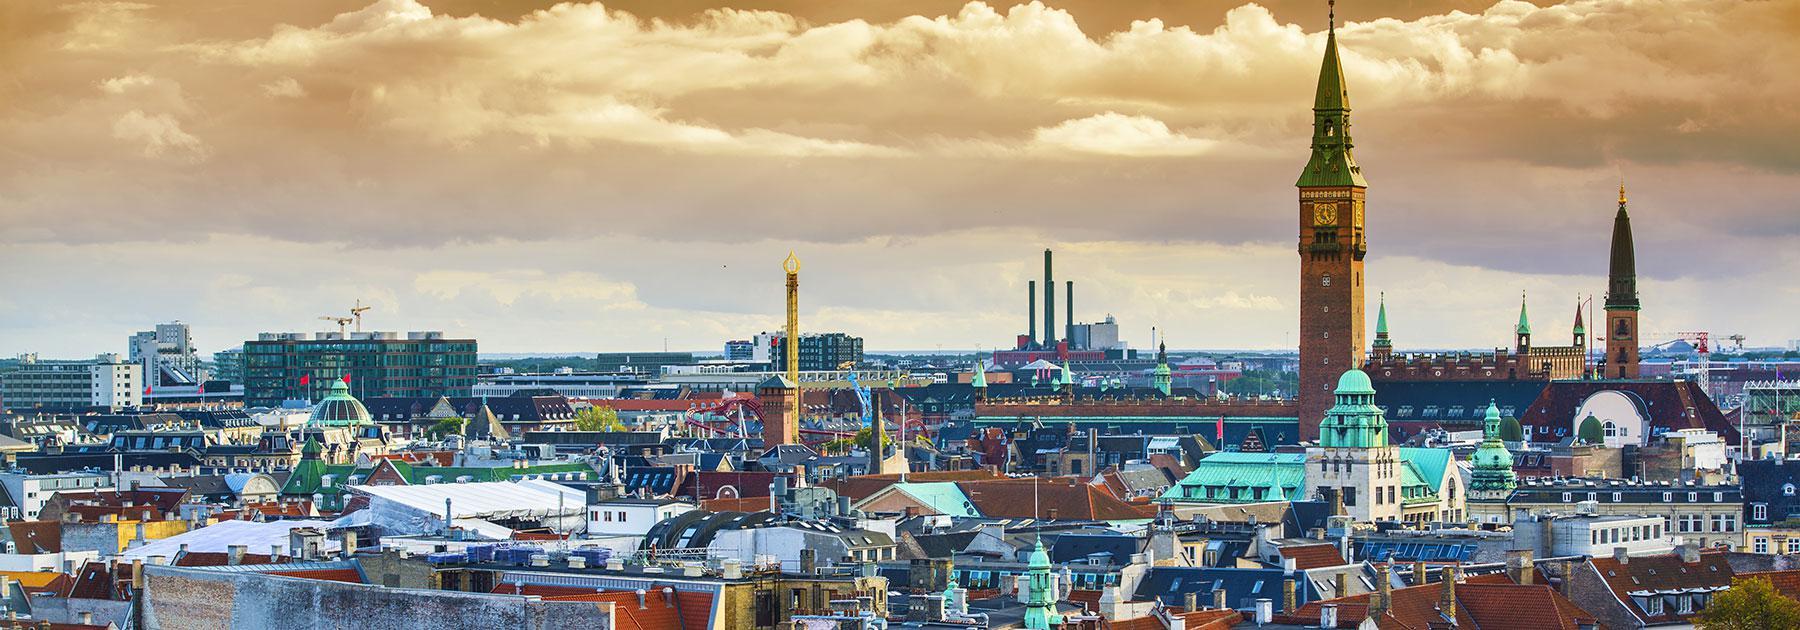 copenhagen-cityscape